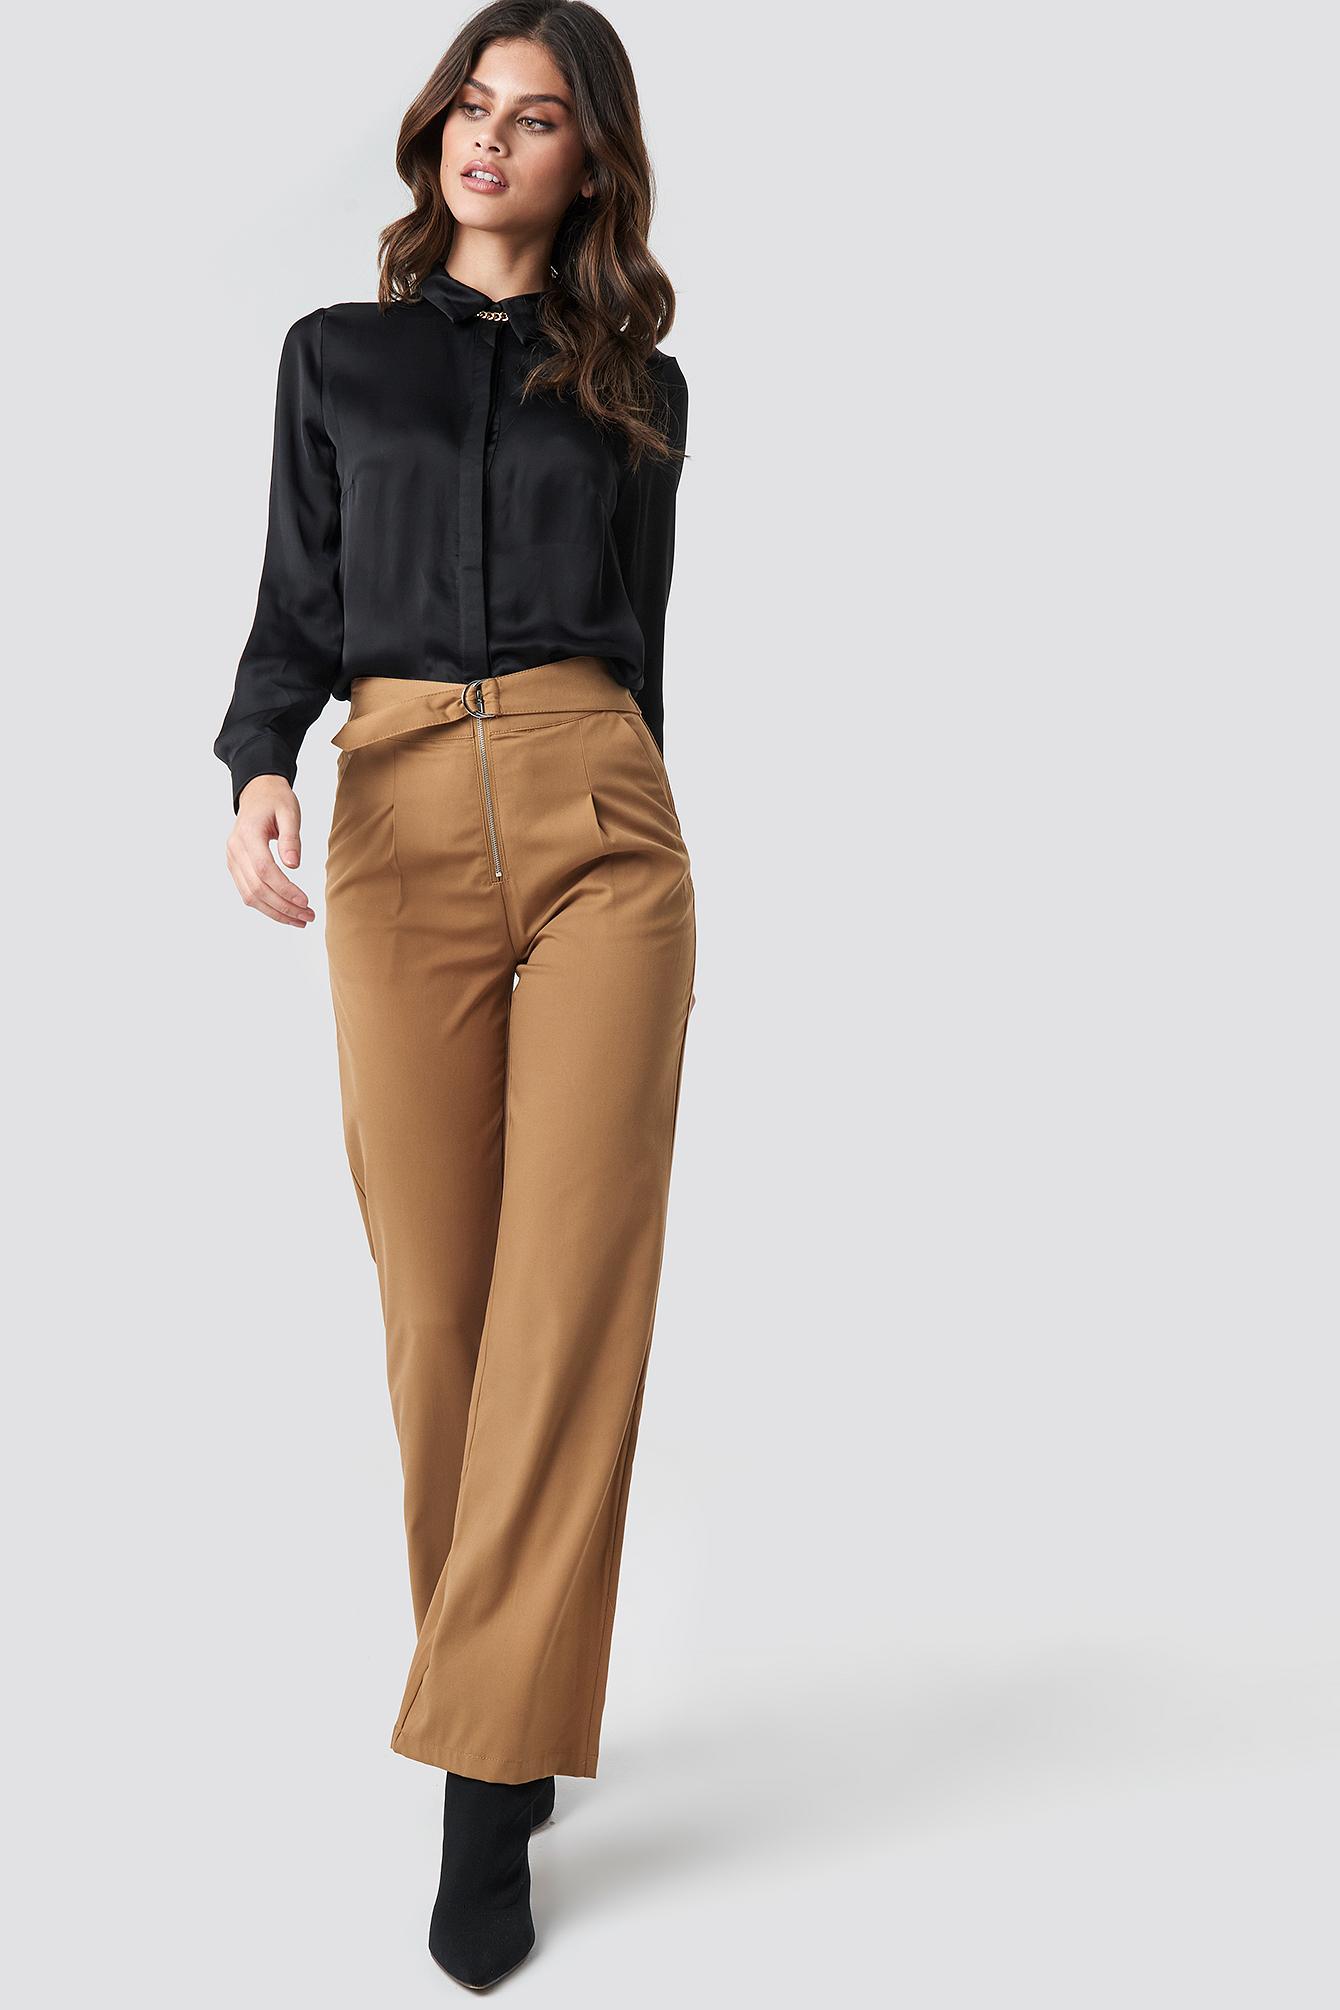 na-kd -  High Waist Zip Detail Pants - Brown,Beige